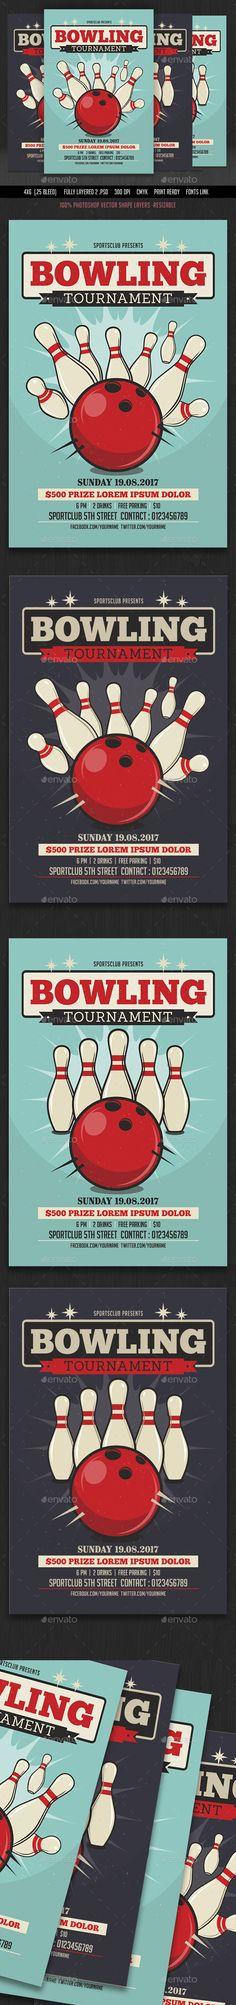 Bowling Tournament Flyer Template Flyer template, Fonts and Texts - bowling flyer template free